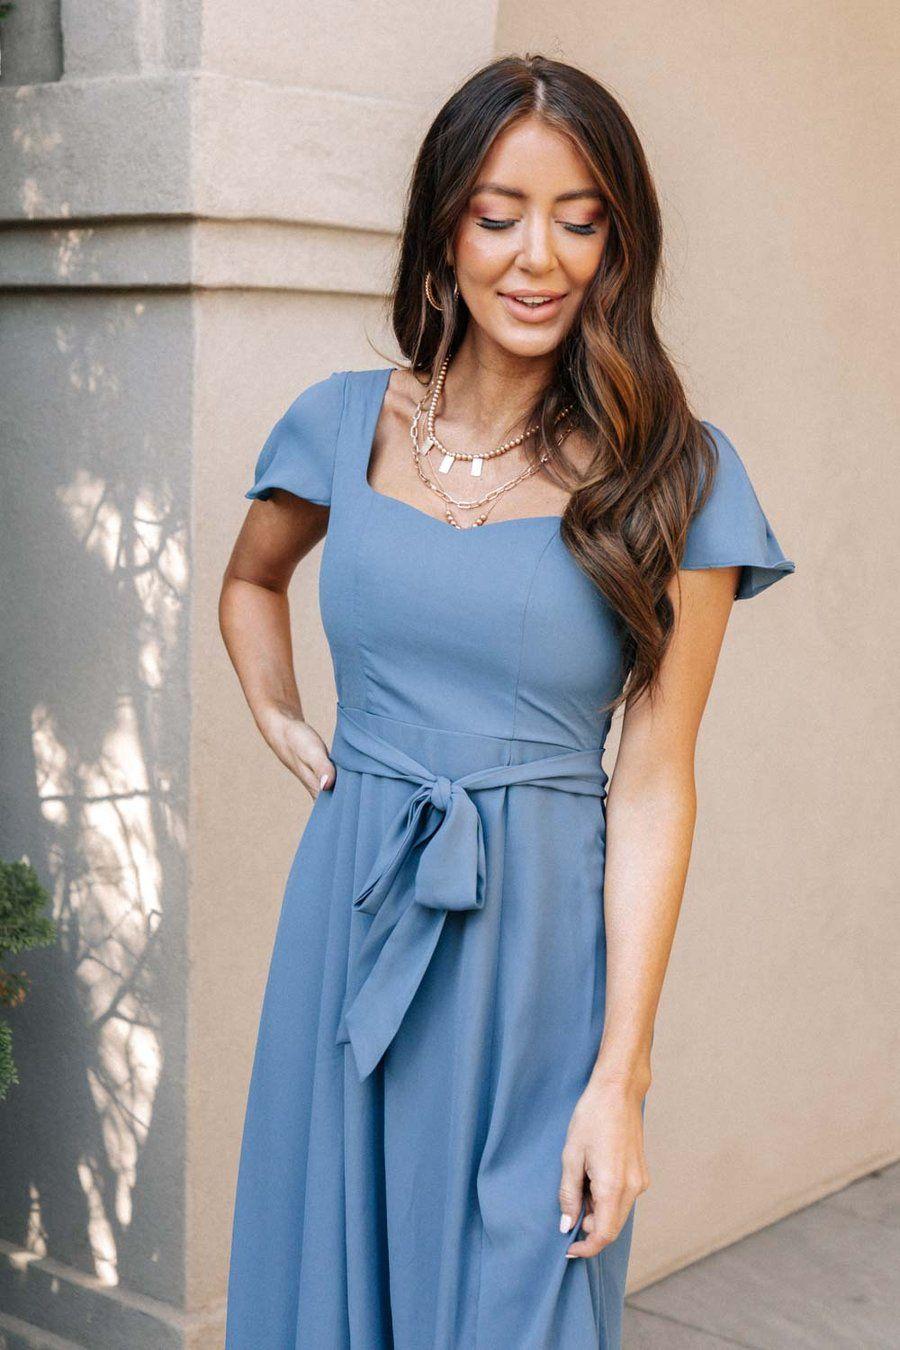 Florence Sweetheart Maxi Dress In Slate Blue Maxi Dress Dresses Maxi [ 1350 x 900 Pixel ]